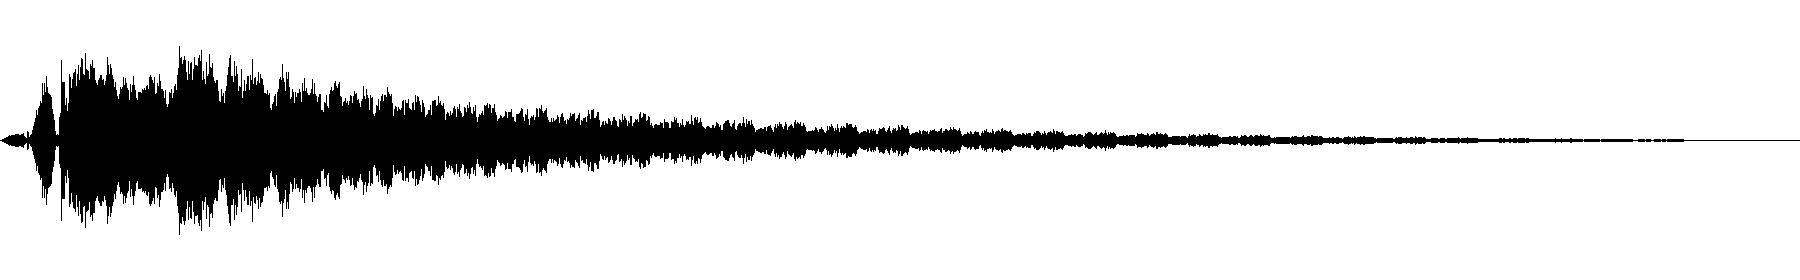 veh2 special sounds   01